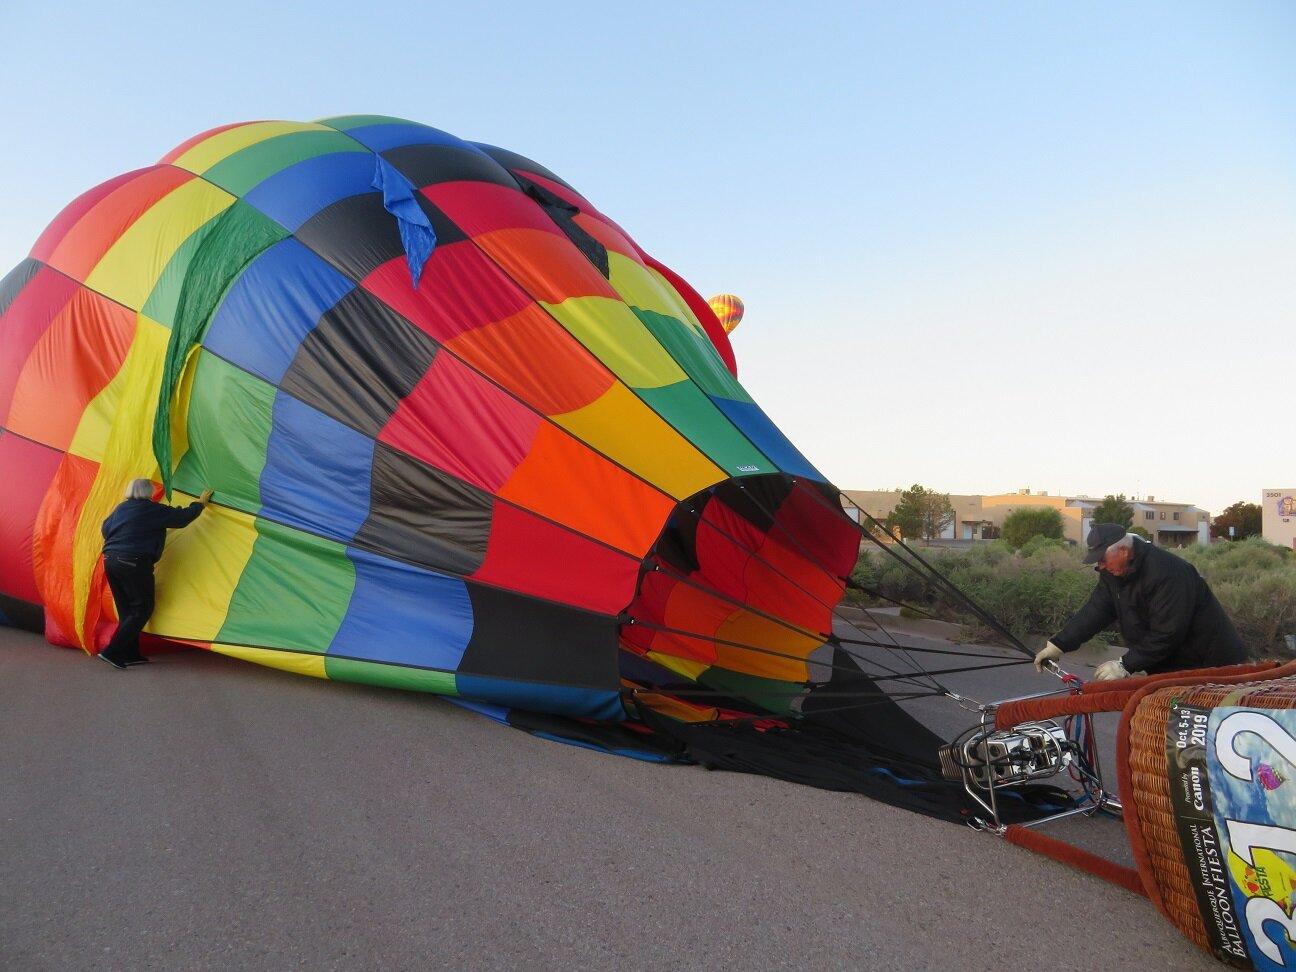 Deflating Whirlaway's envelope